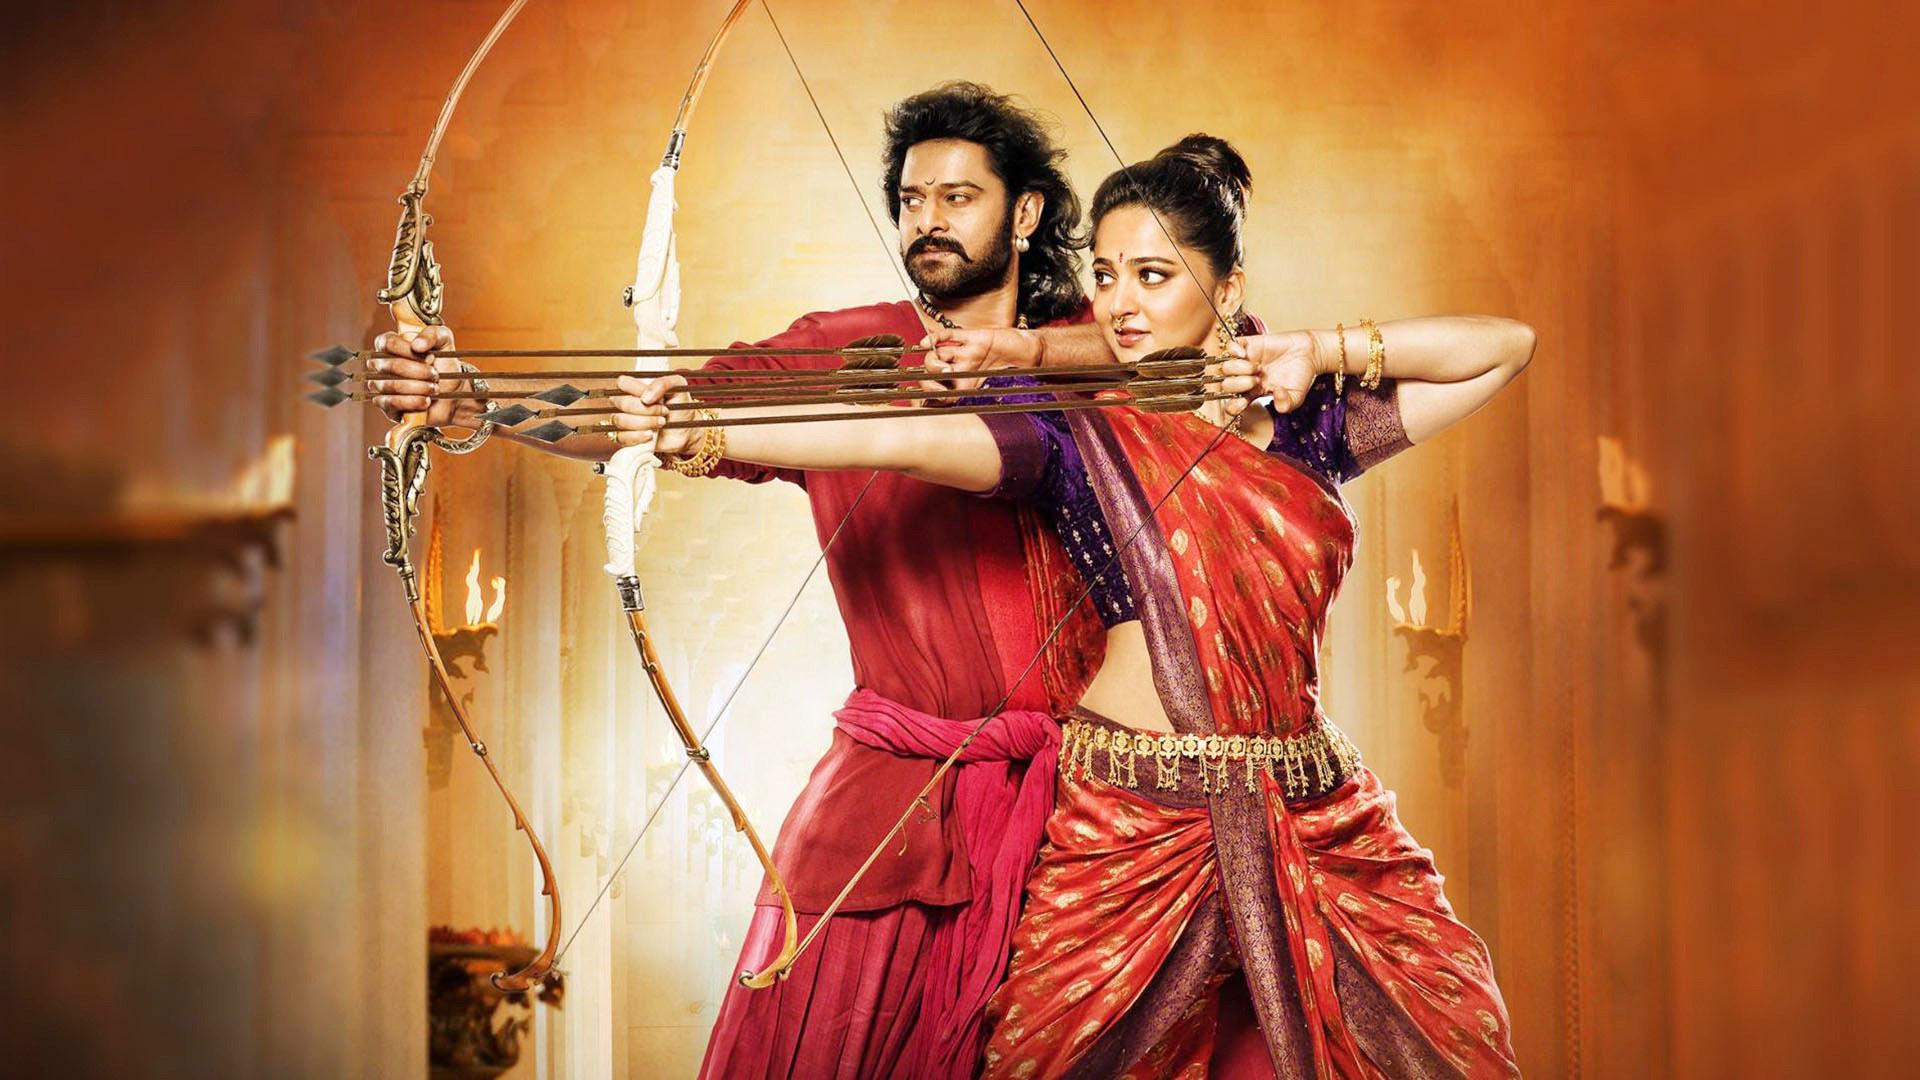 bahubali-2-prabhas-and-anushka-trying-to-goal-hd - creators cult